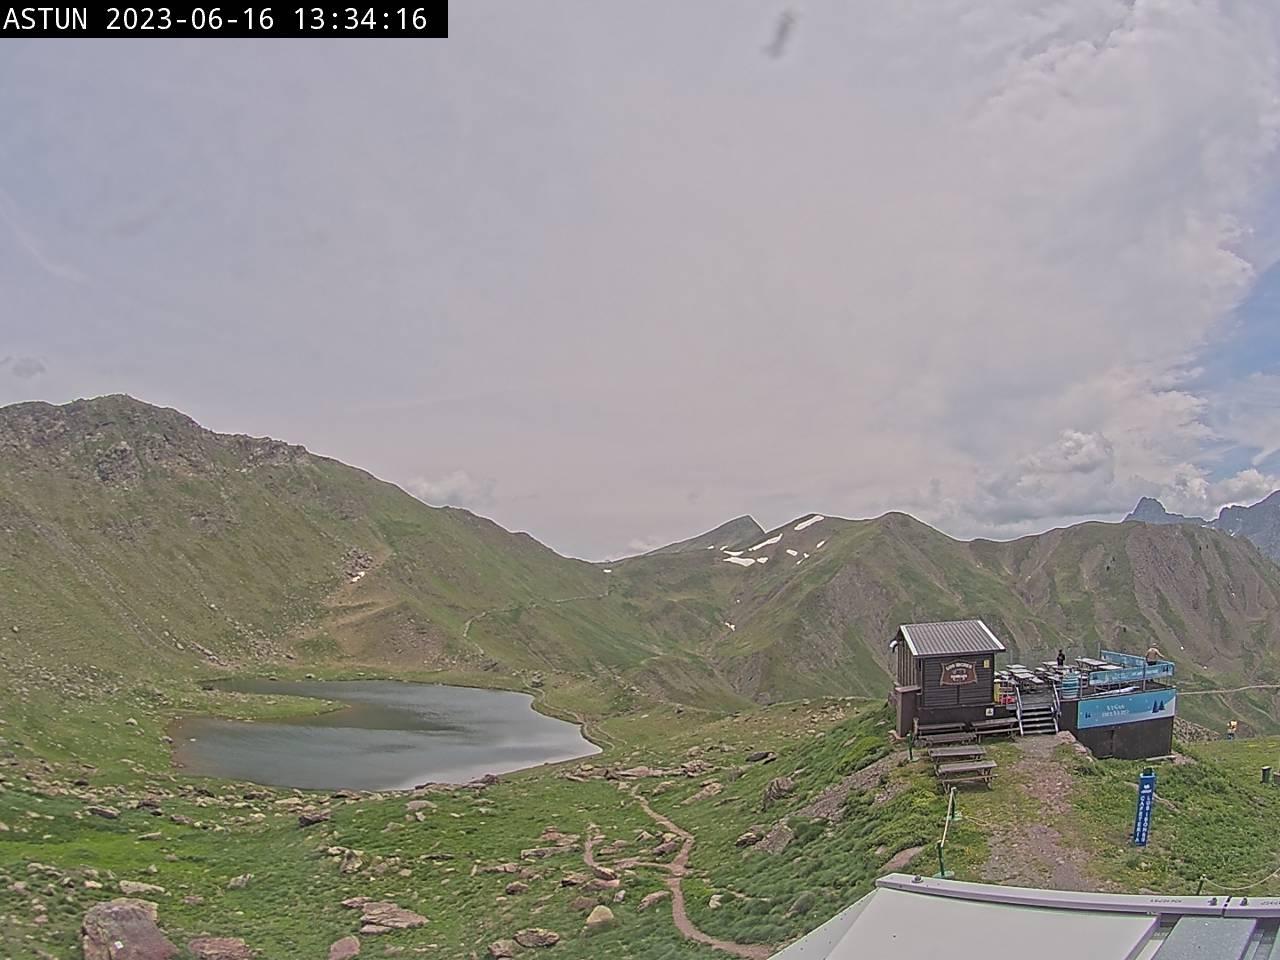 Webcam de Cima Raca